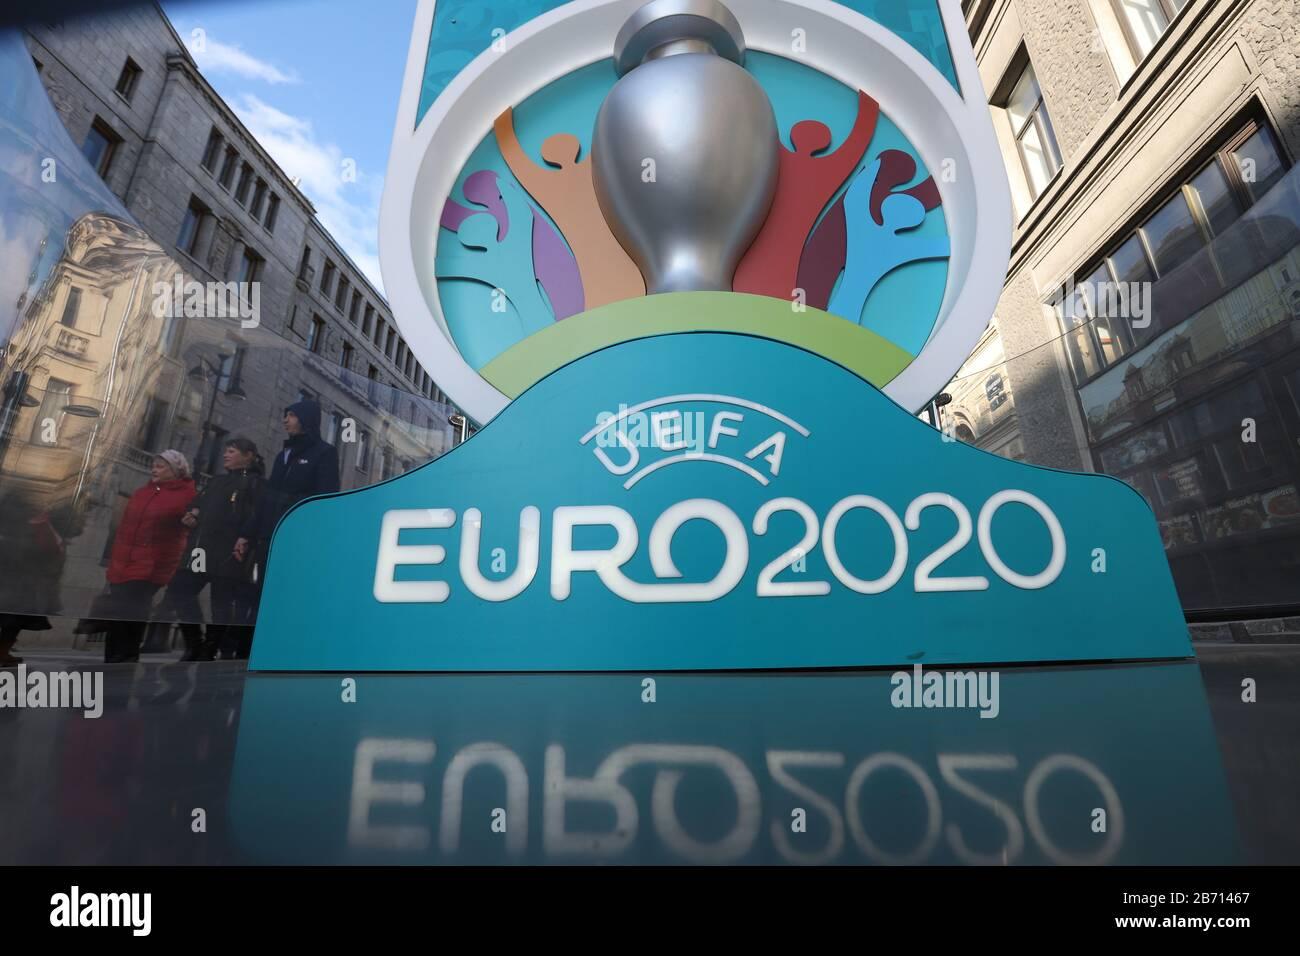 logo of uefa euro 2020 at a countdown clock to the tournament stock photo alamy https www alamy com logo of uefa euro 2020 at a countdown clock to the tournament image348535215 html